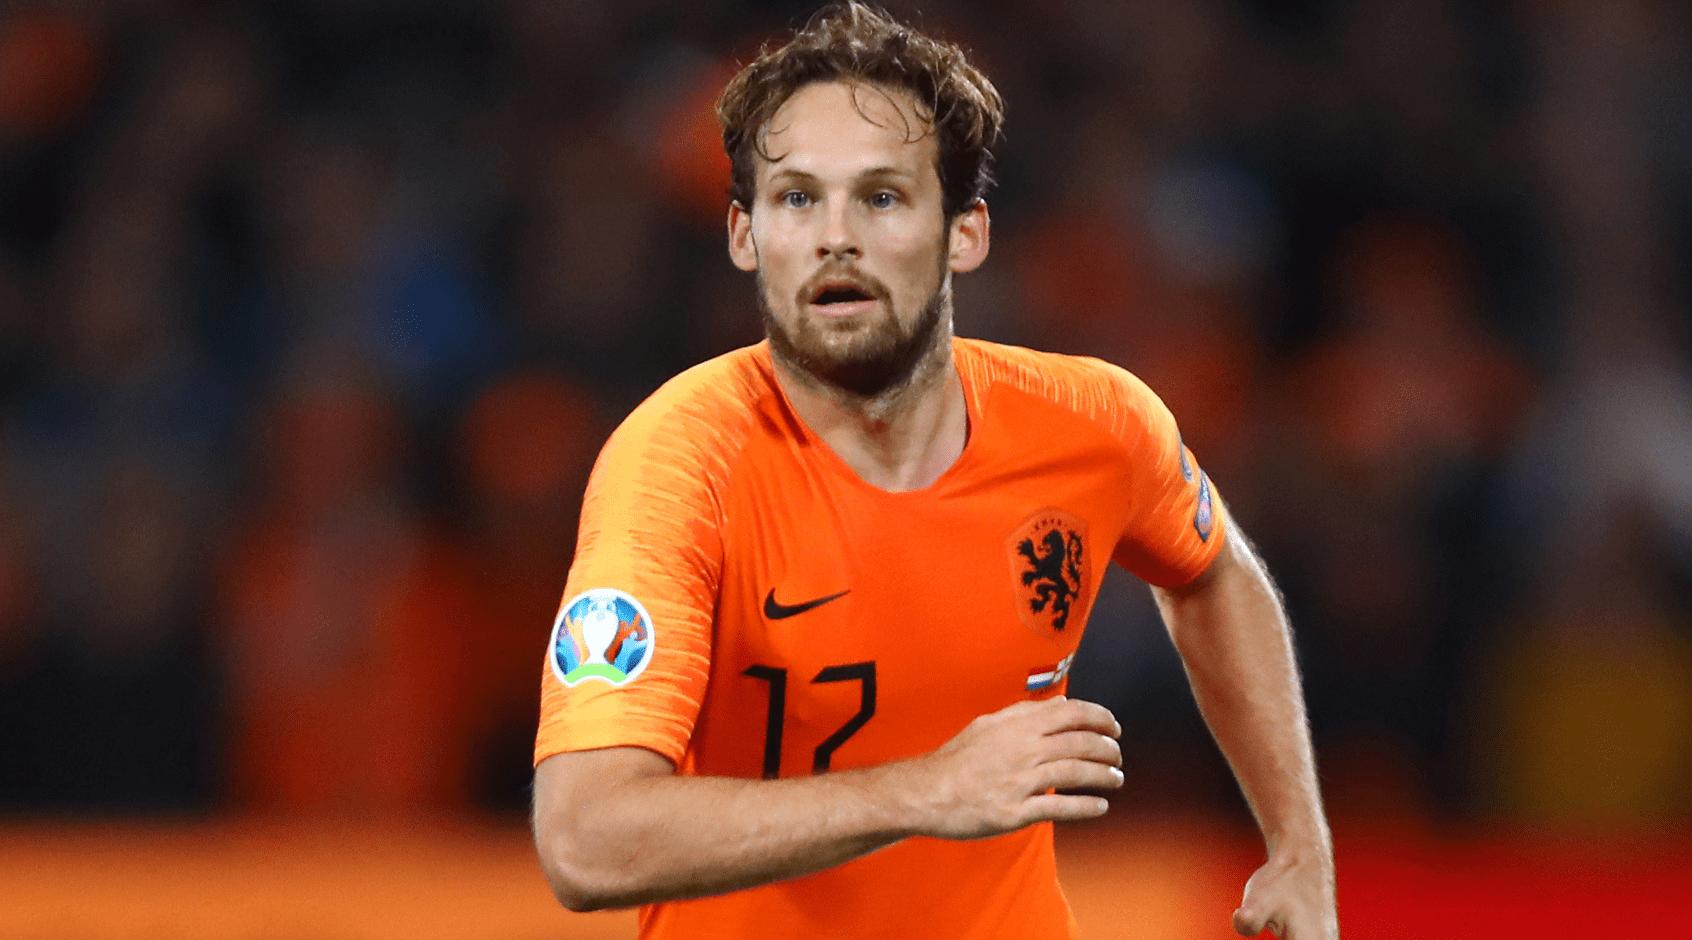 Дейли Блинд нидерландский футболист